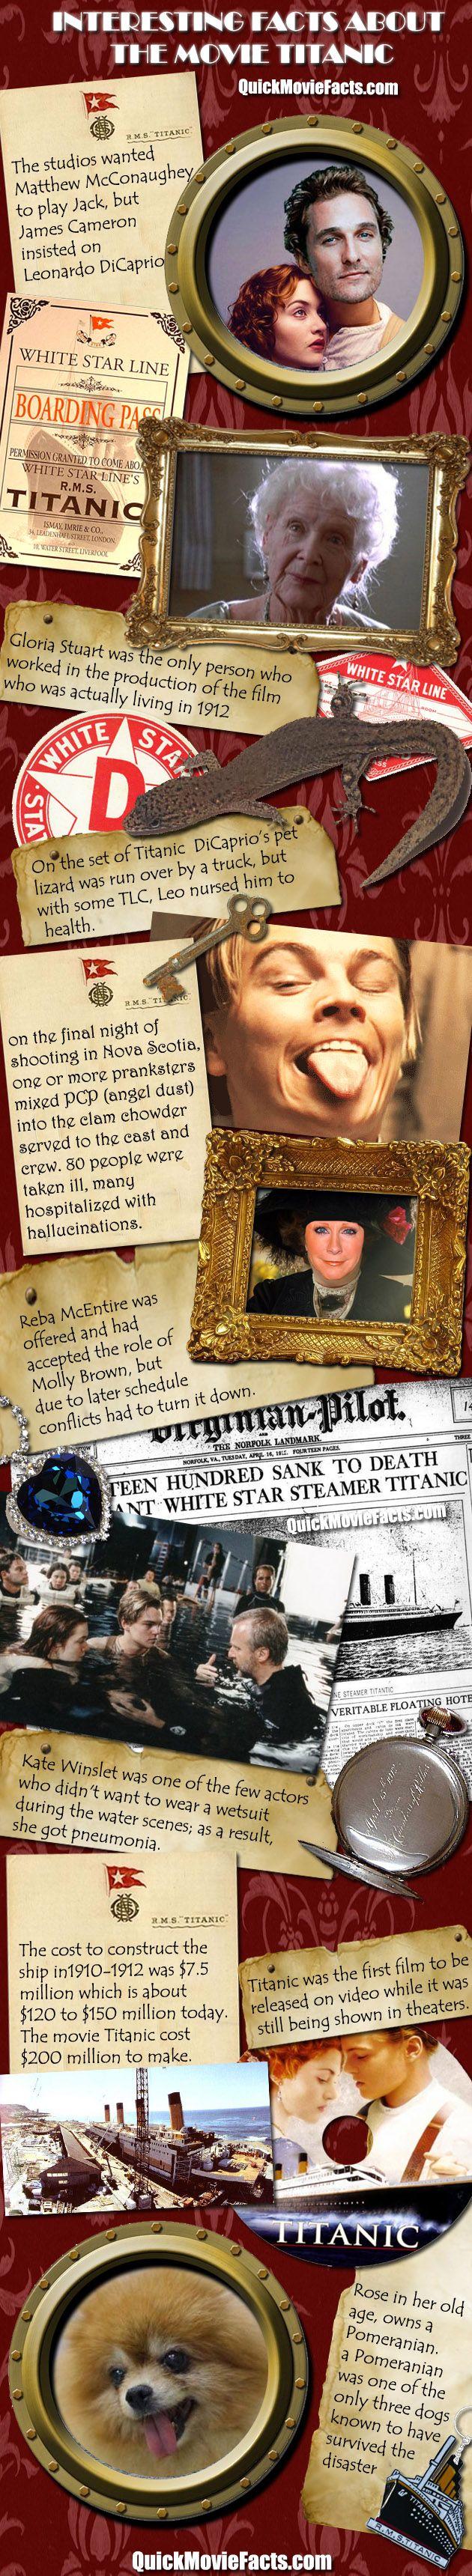 Amazing titanic movie facts